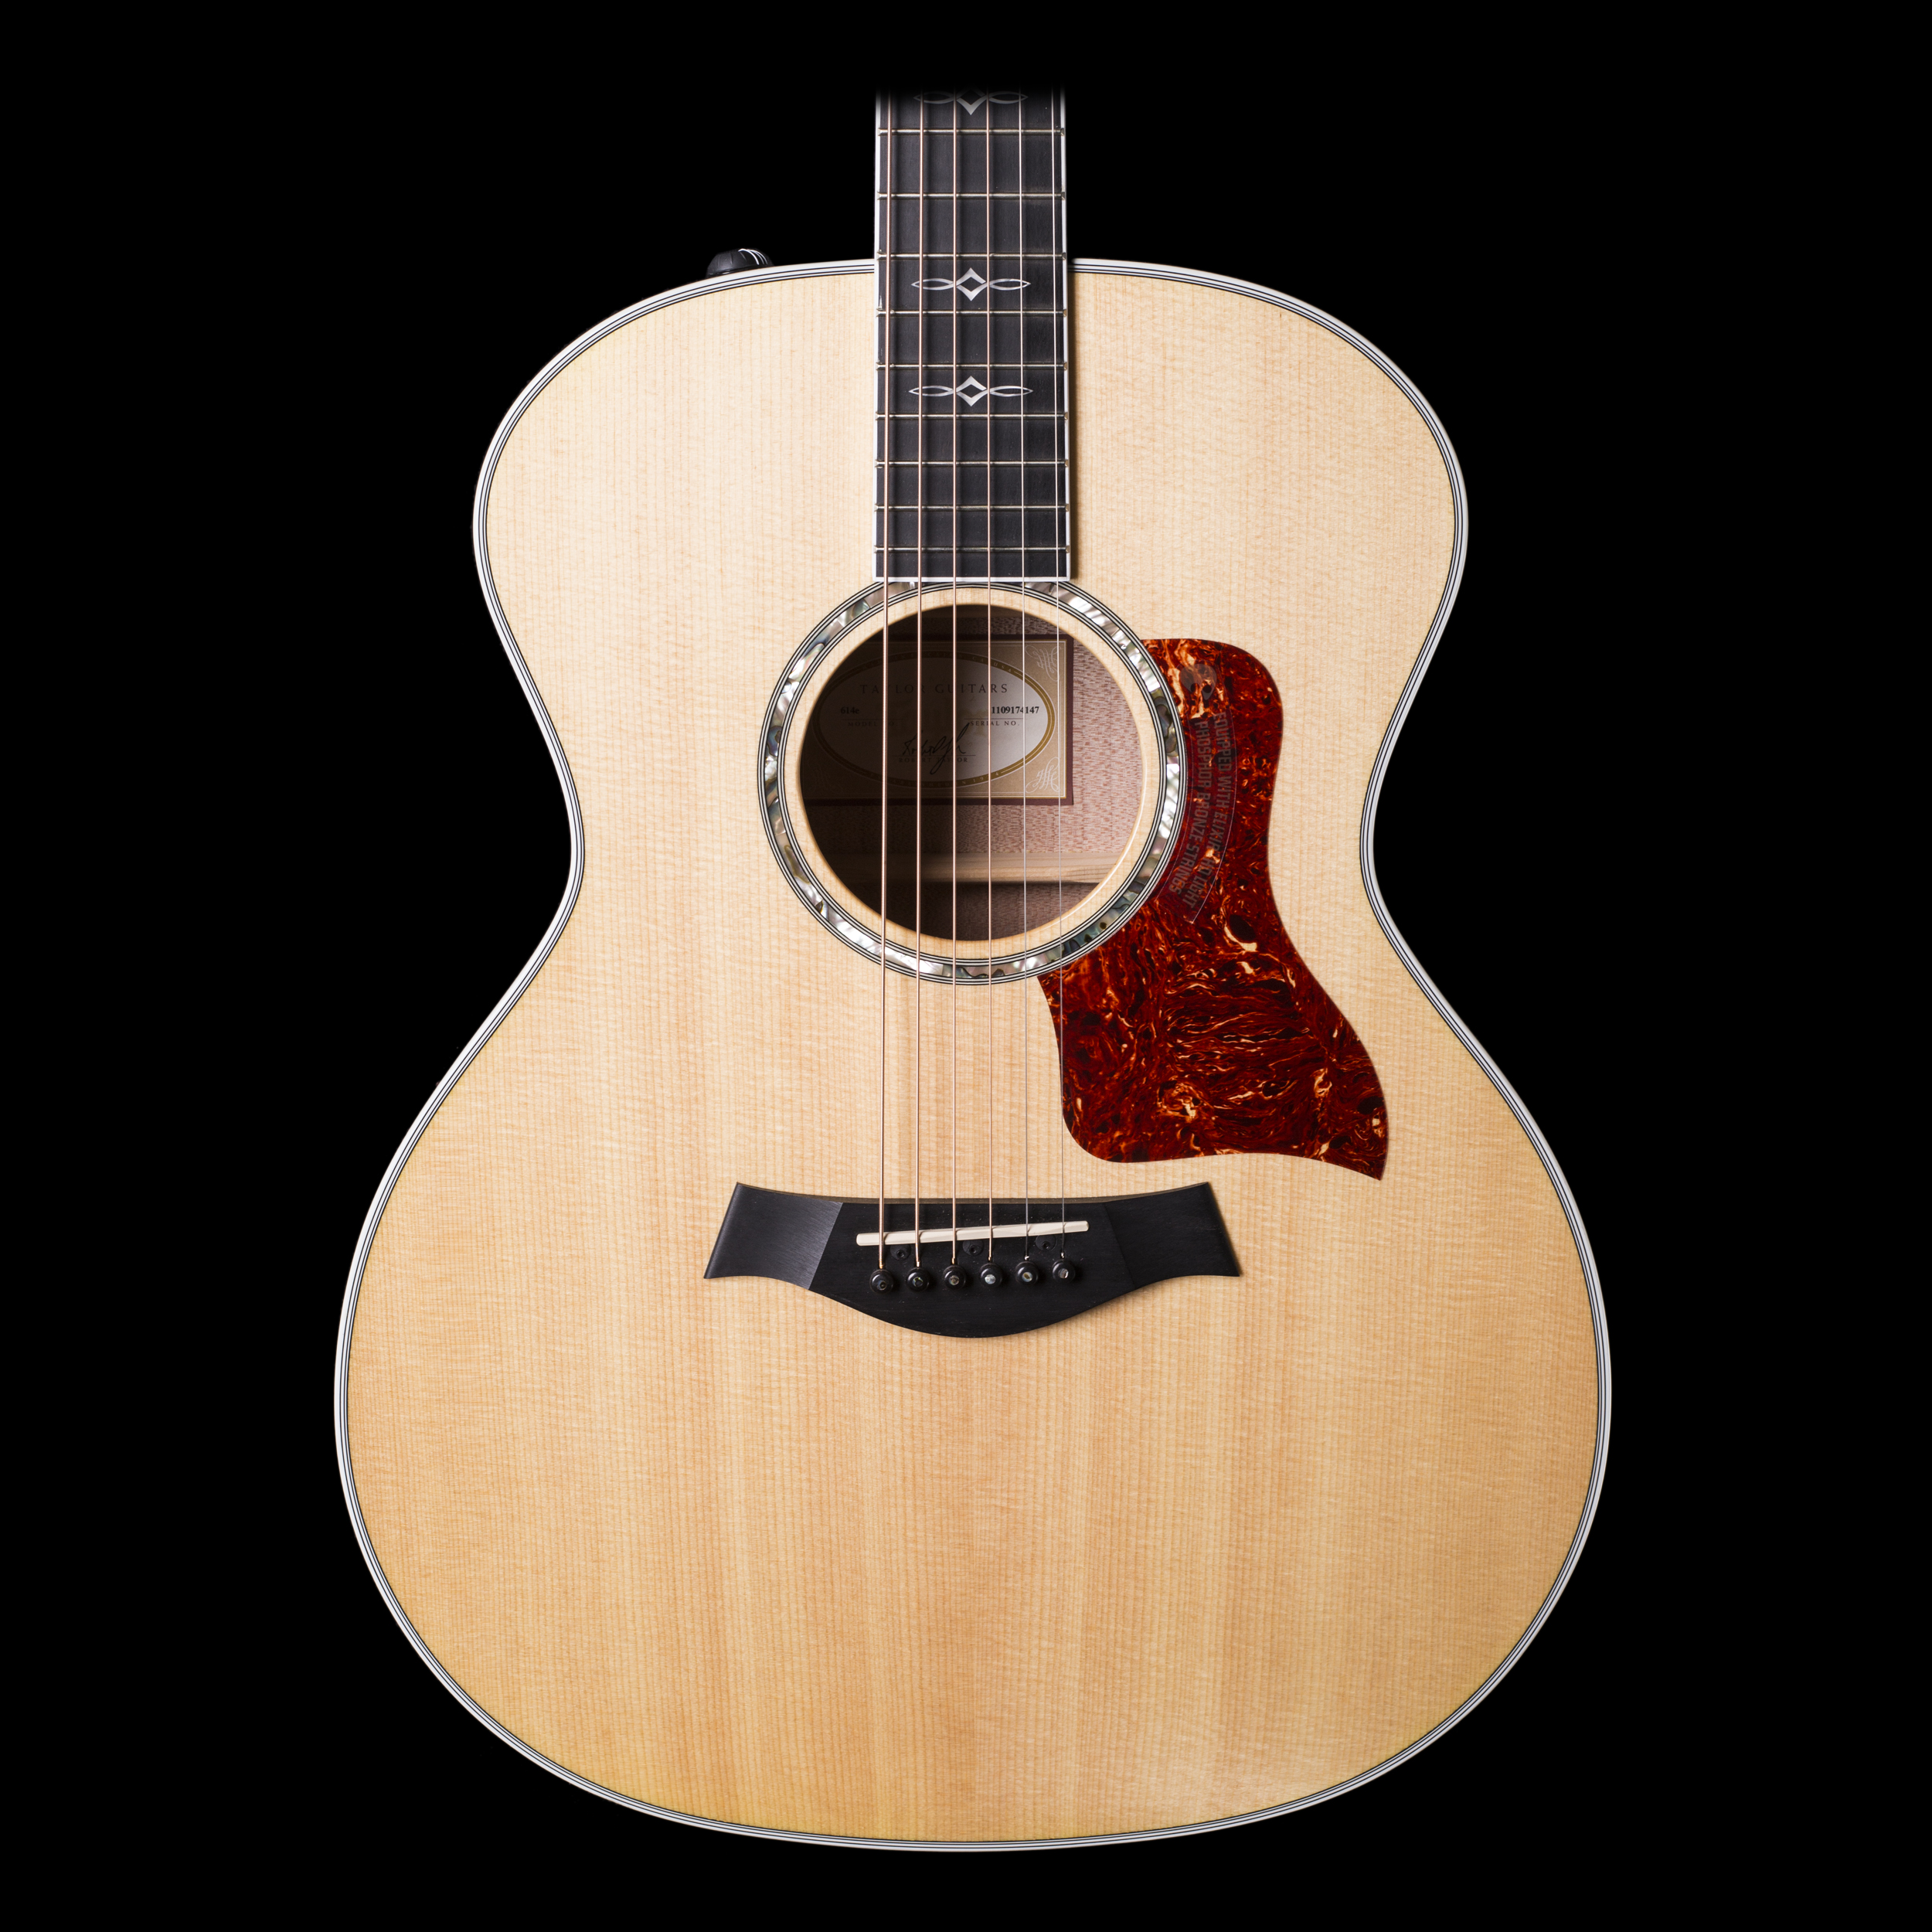 taylor 614e grand auditorium prototype acoustic electric guitar ebay. Black Bedroom Furniture Sets. Home Design Ideas